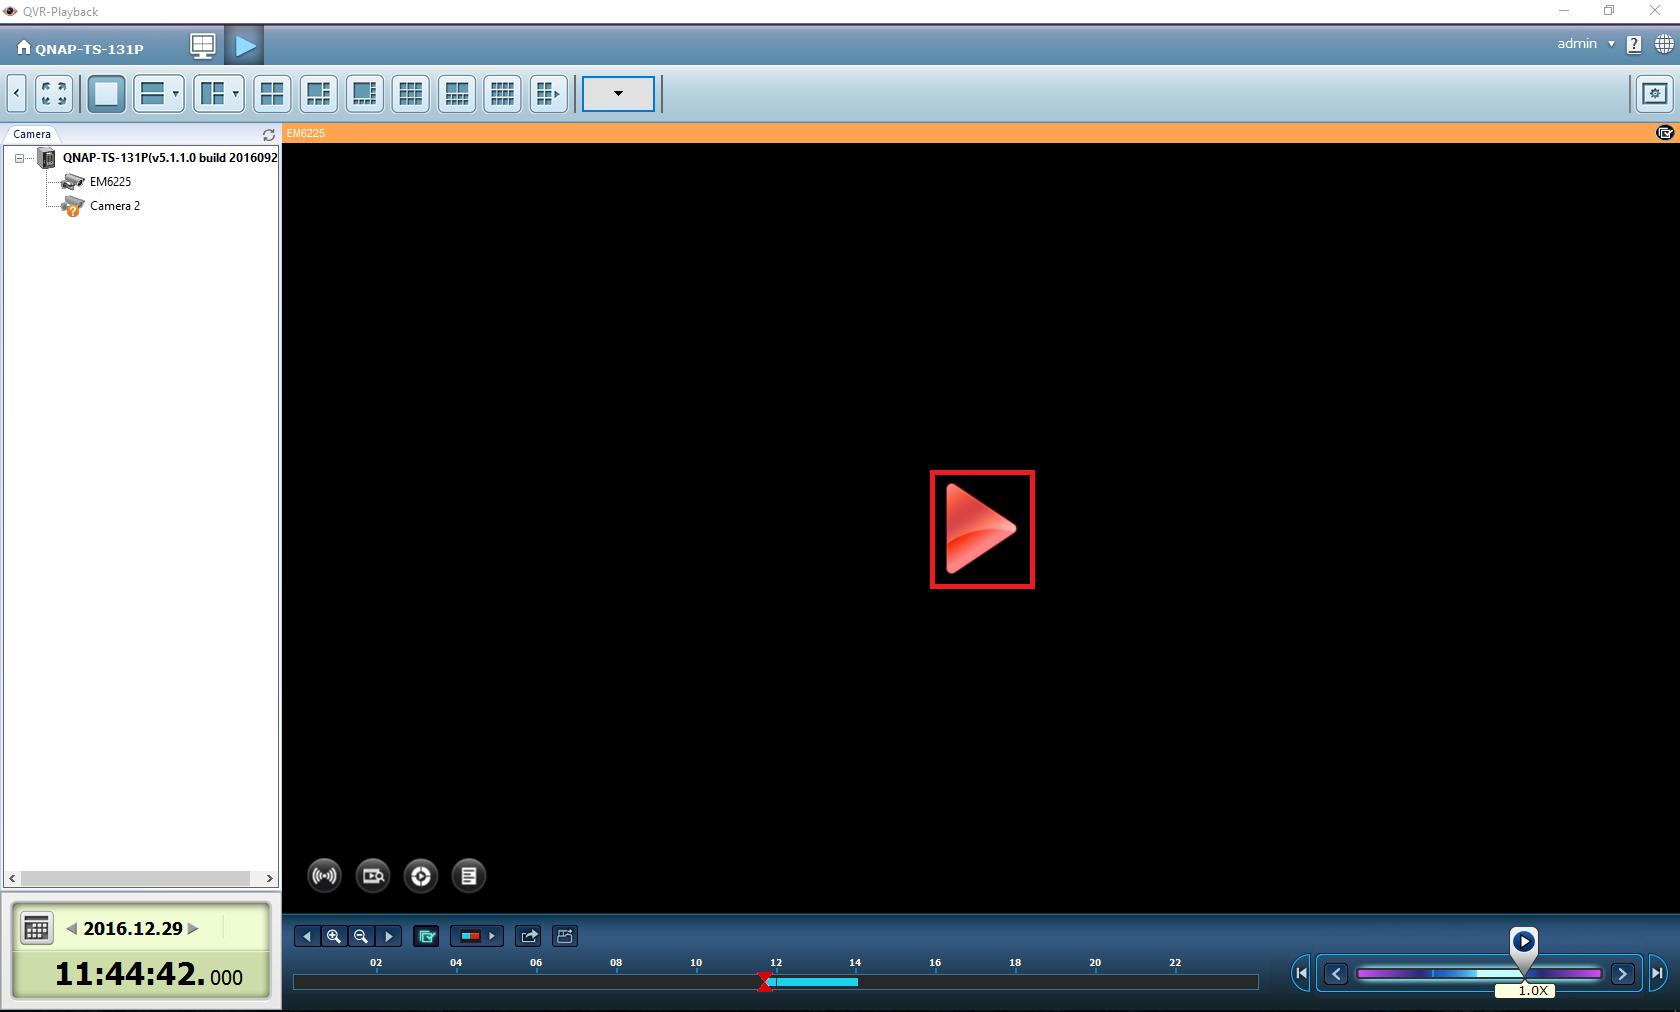 EM63XX_NAS_QNAP_Playback_recording_UK.png